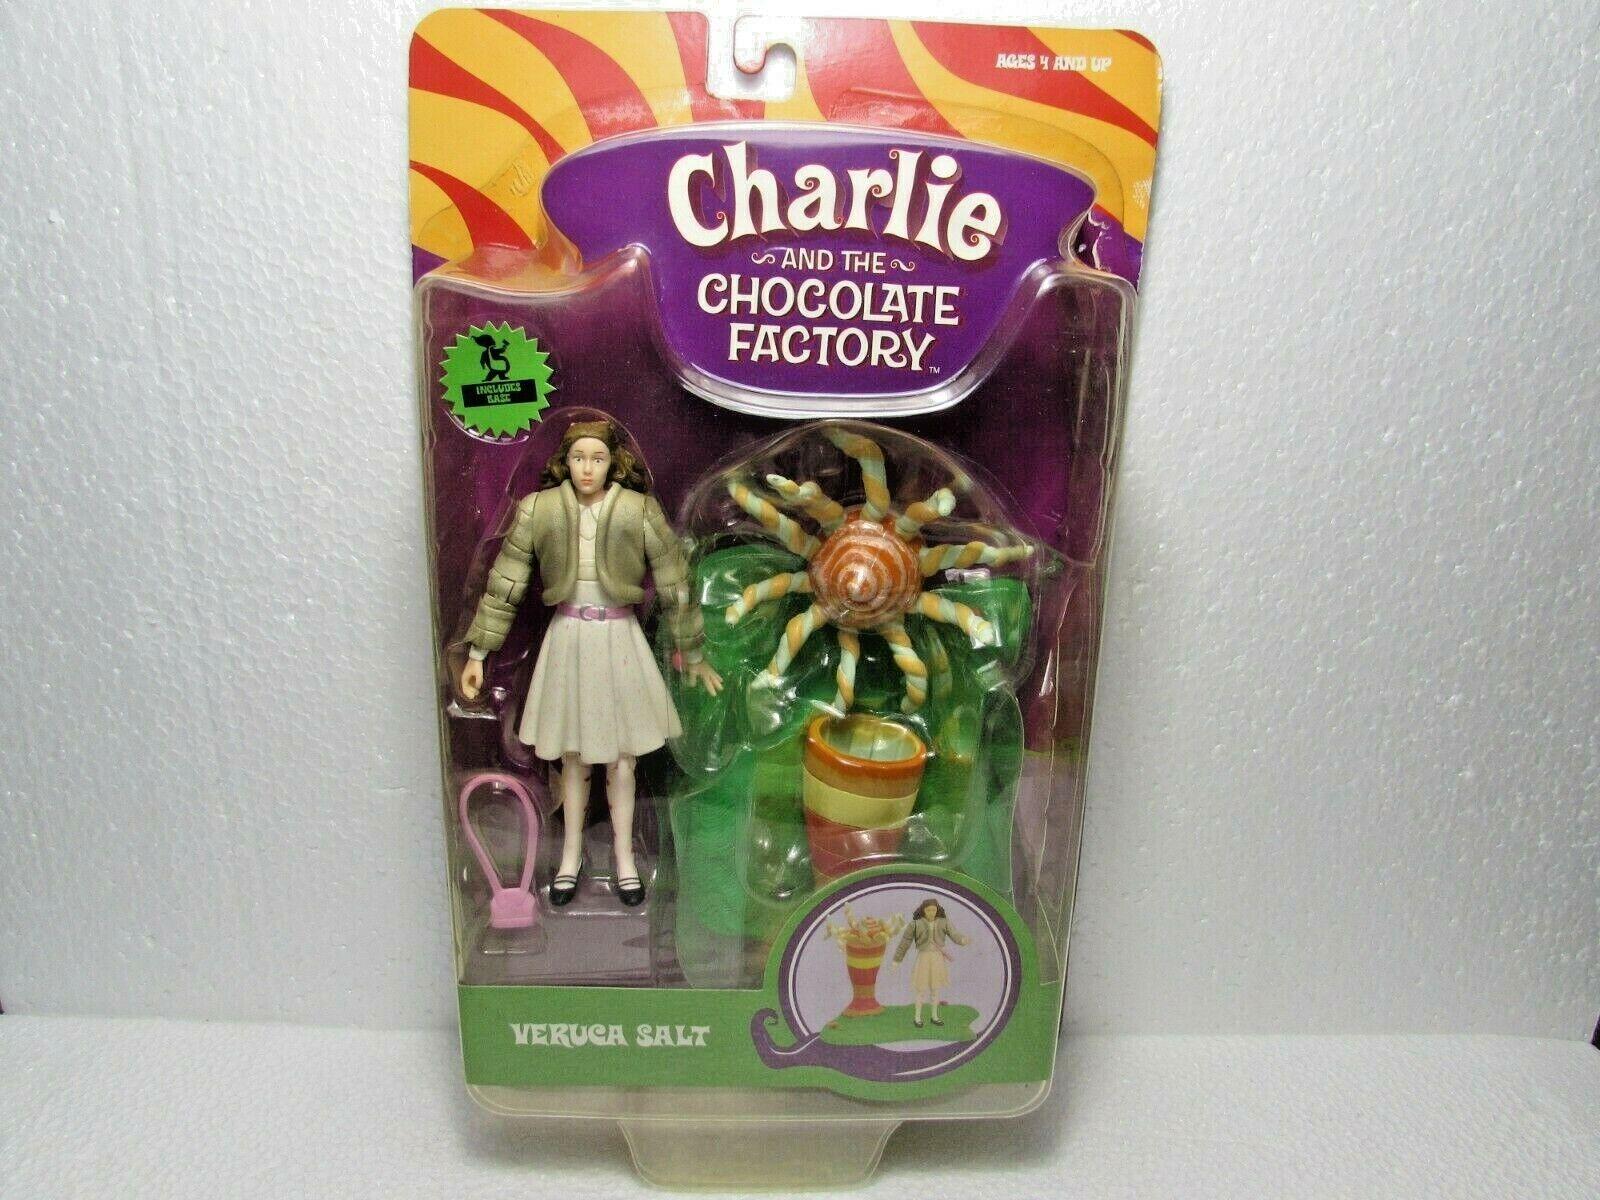 Charlie e the Chocolate Factory Veruca  Salt azione cifra nuovo Shelf Wear  stile classico